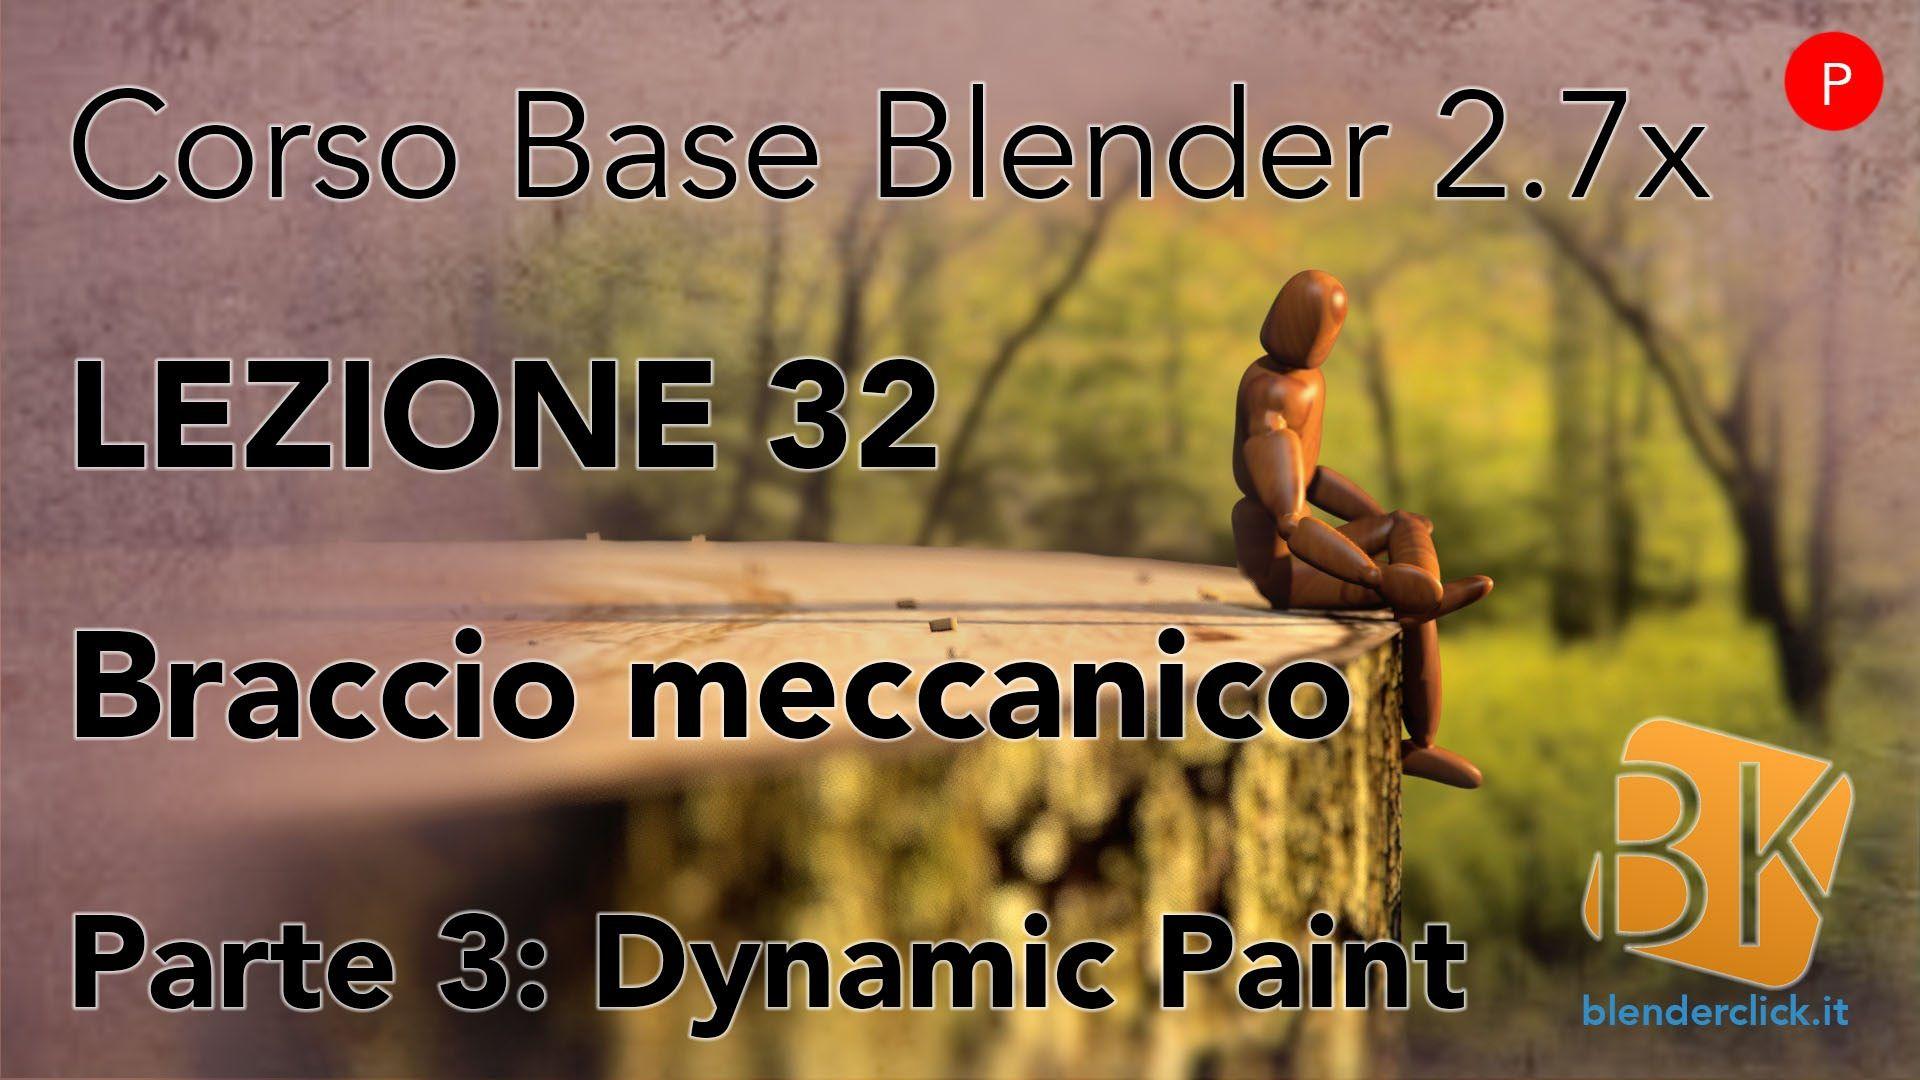 Blender 2.7x - Corso Base - Lezione 32 (PRATICA)  [ITA]